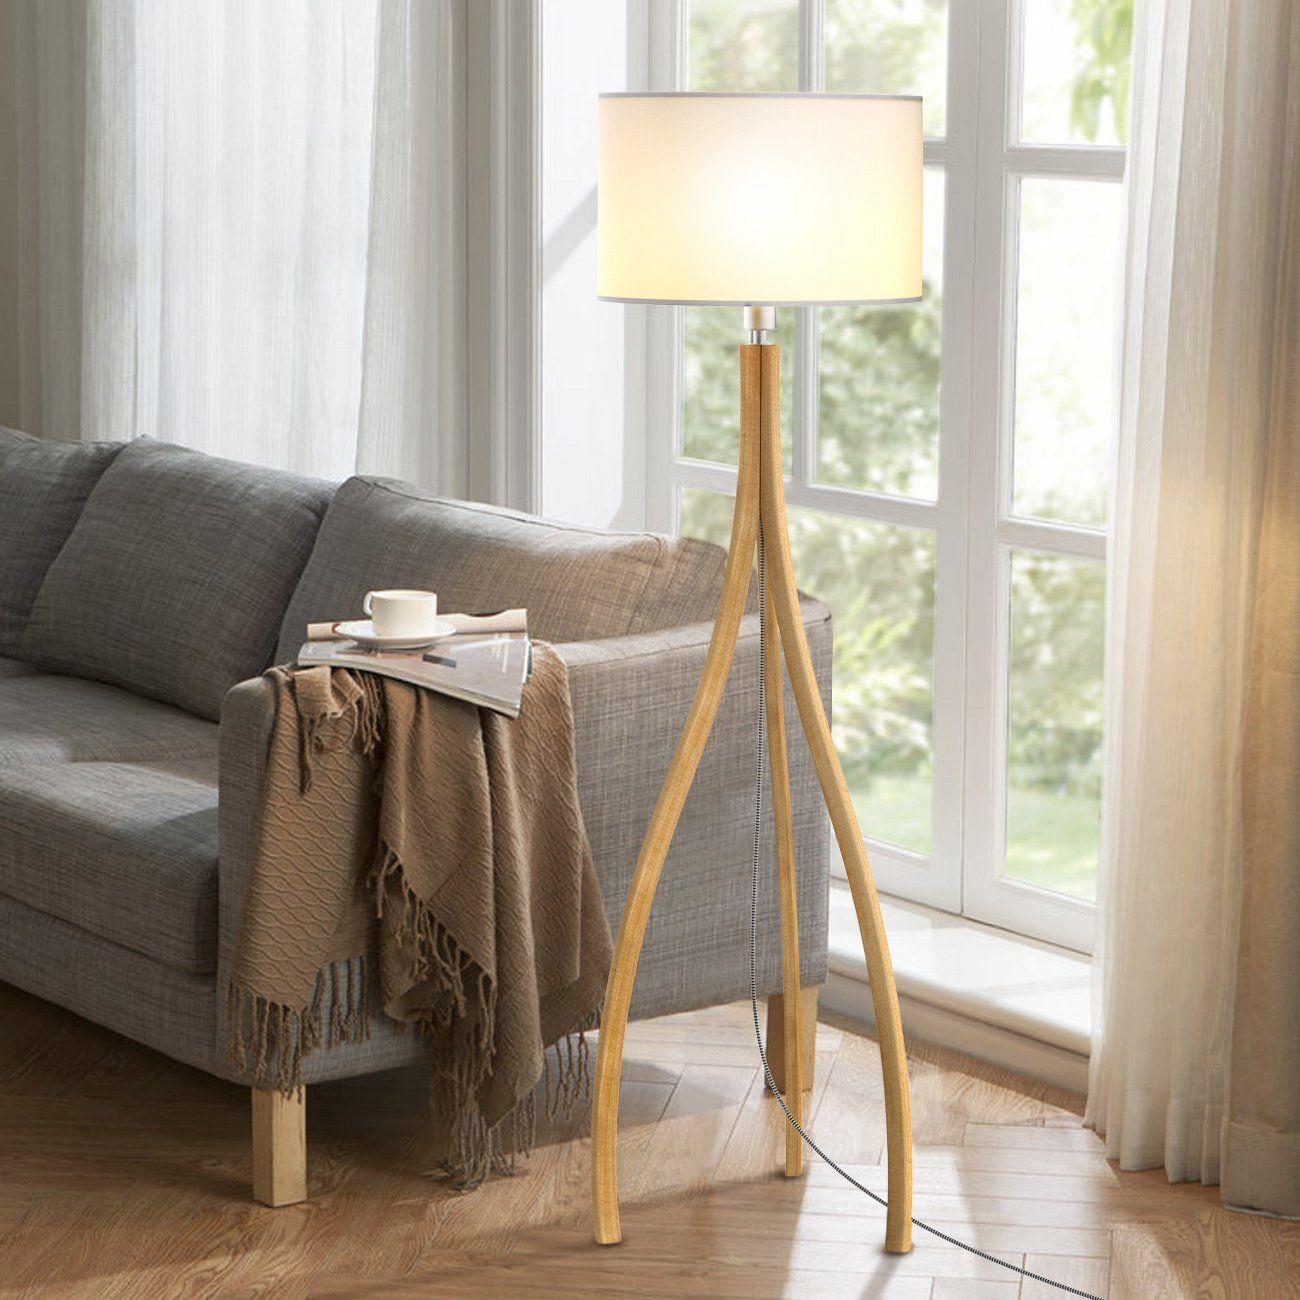 Tomons Modern Artistic Style Wood Tripod Floor Lamp White Tc Cloth Shade E26 E27 Bulb Base 160cm 63inch Height Tripod Floor Lamps White Tripod Floor Lamp Lamp